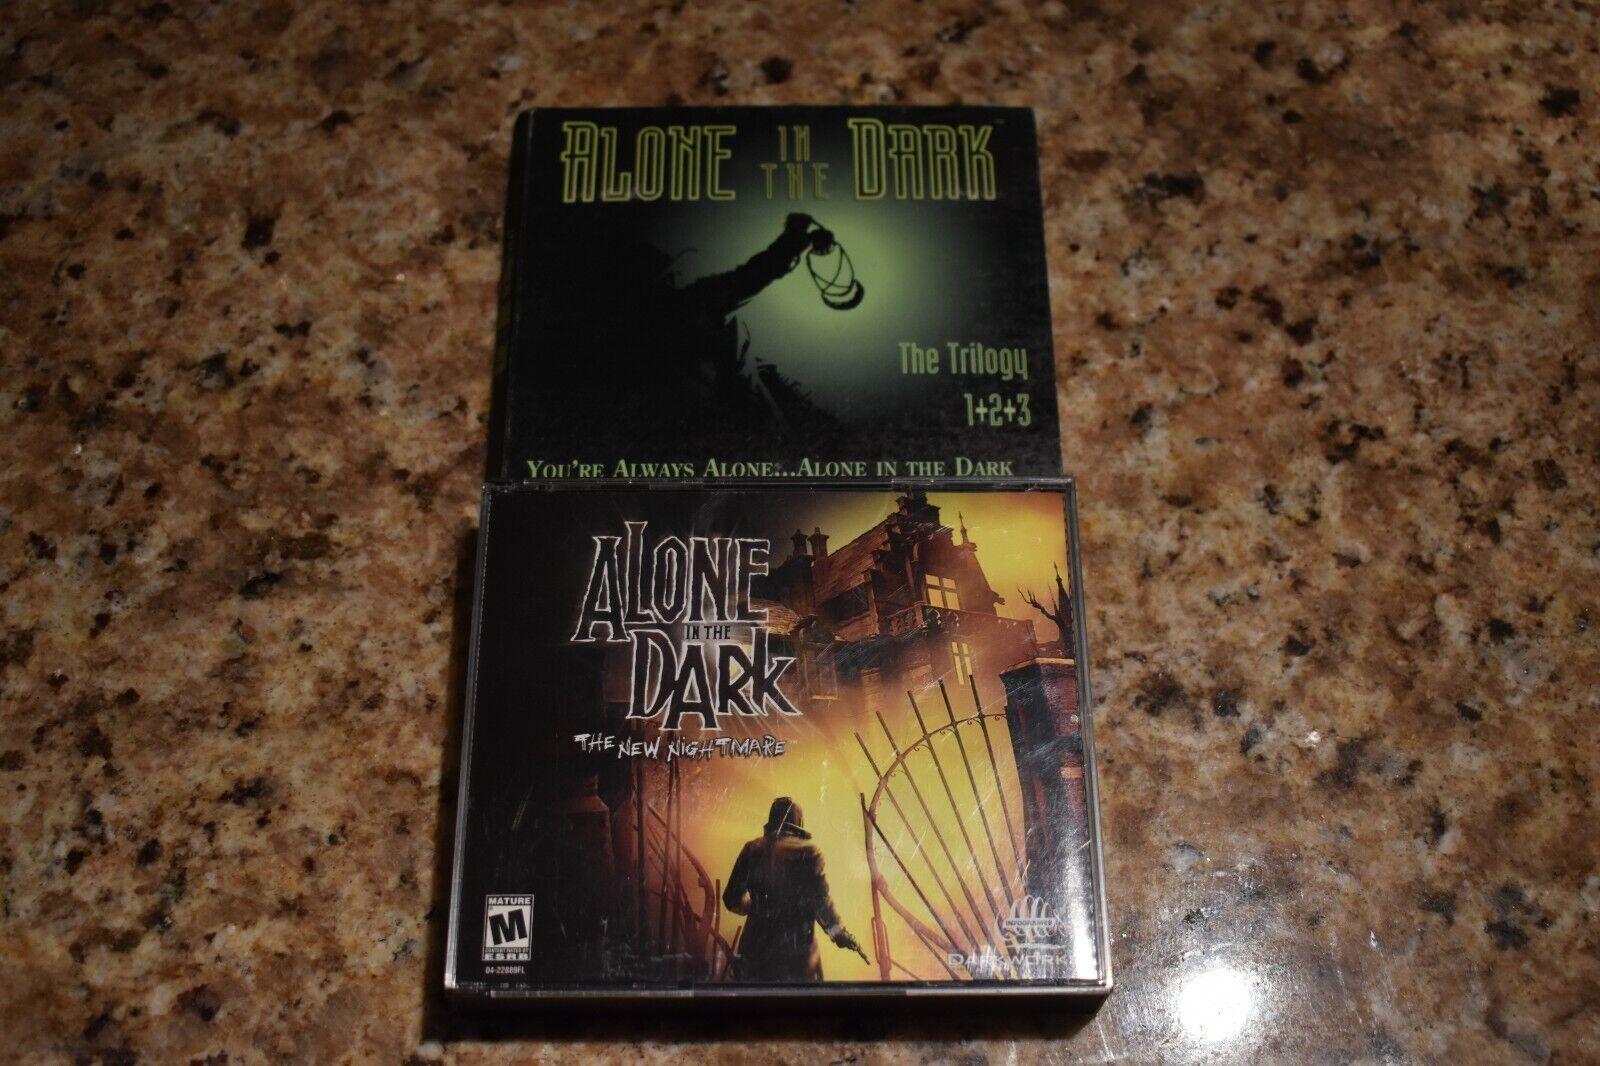 Alone In The Dark Trilogy Pc 1997 For Sale Online Ebay